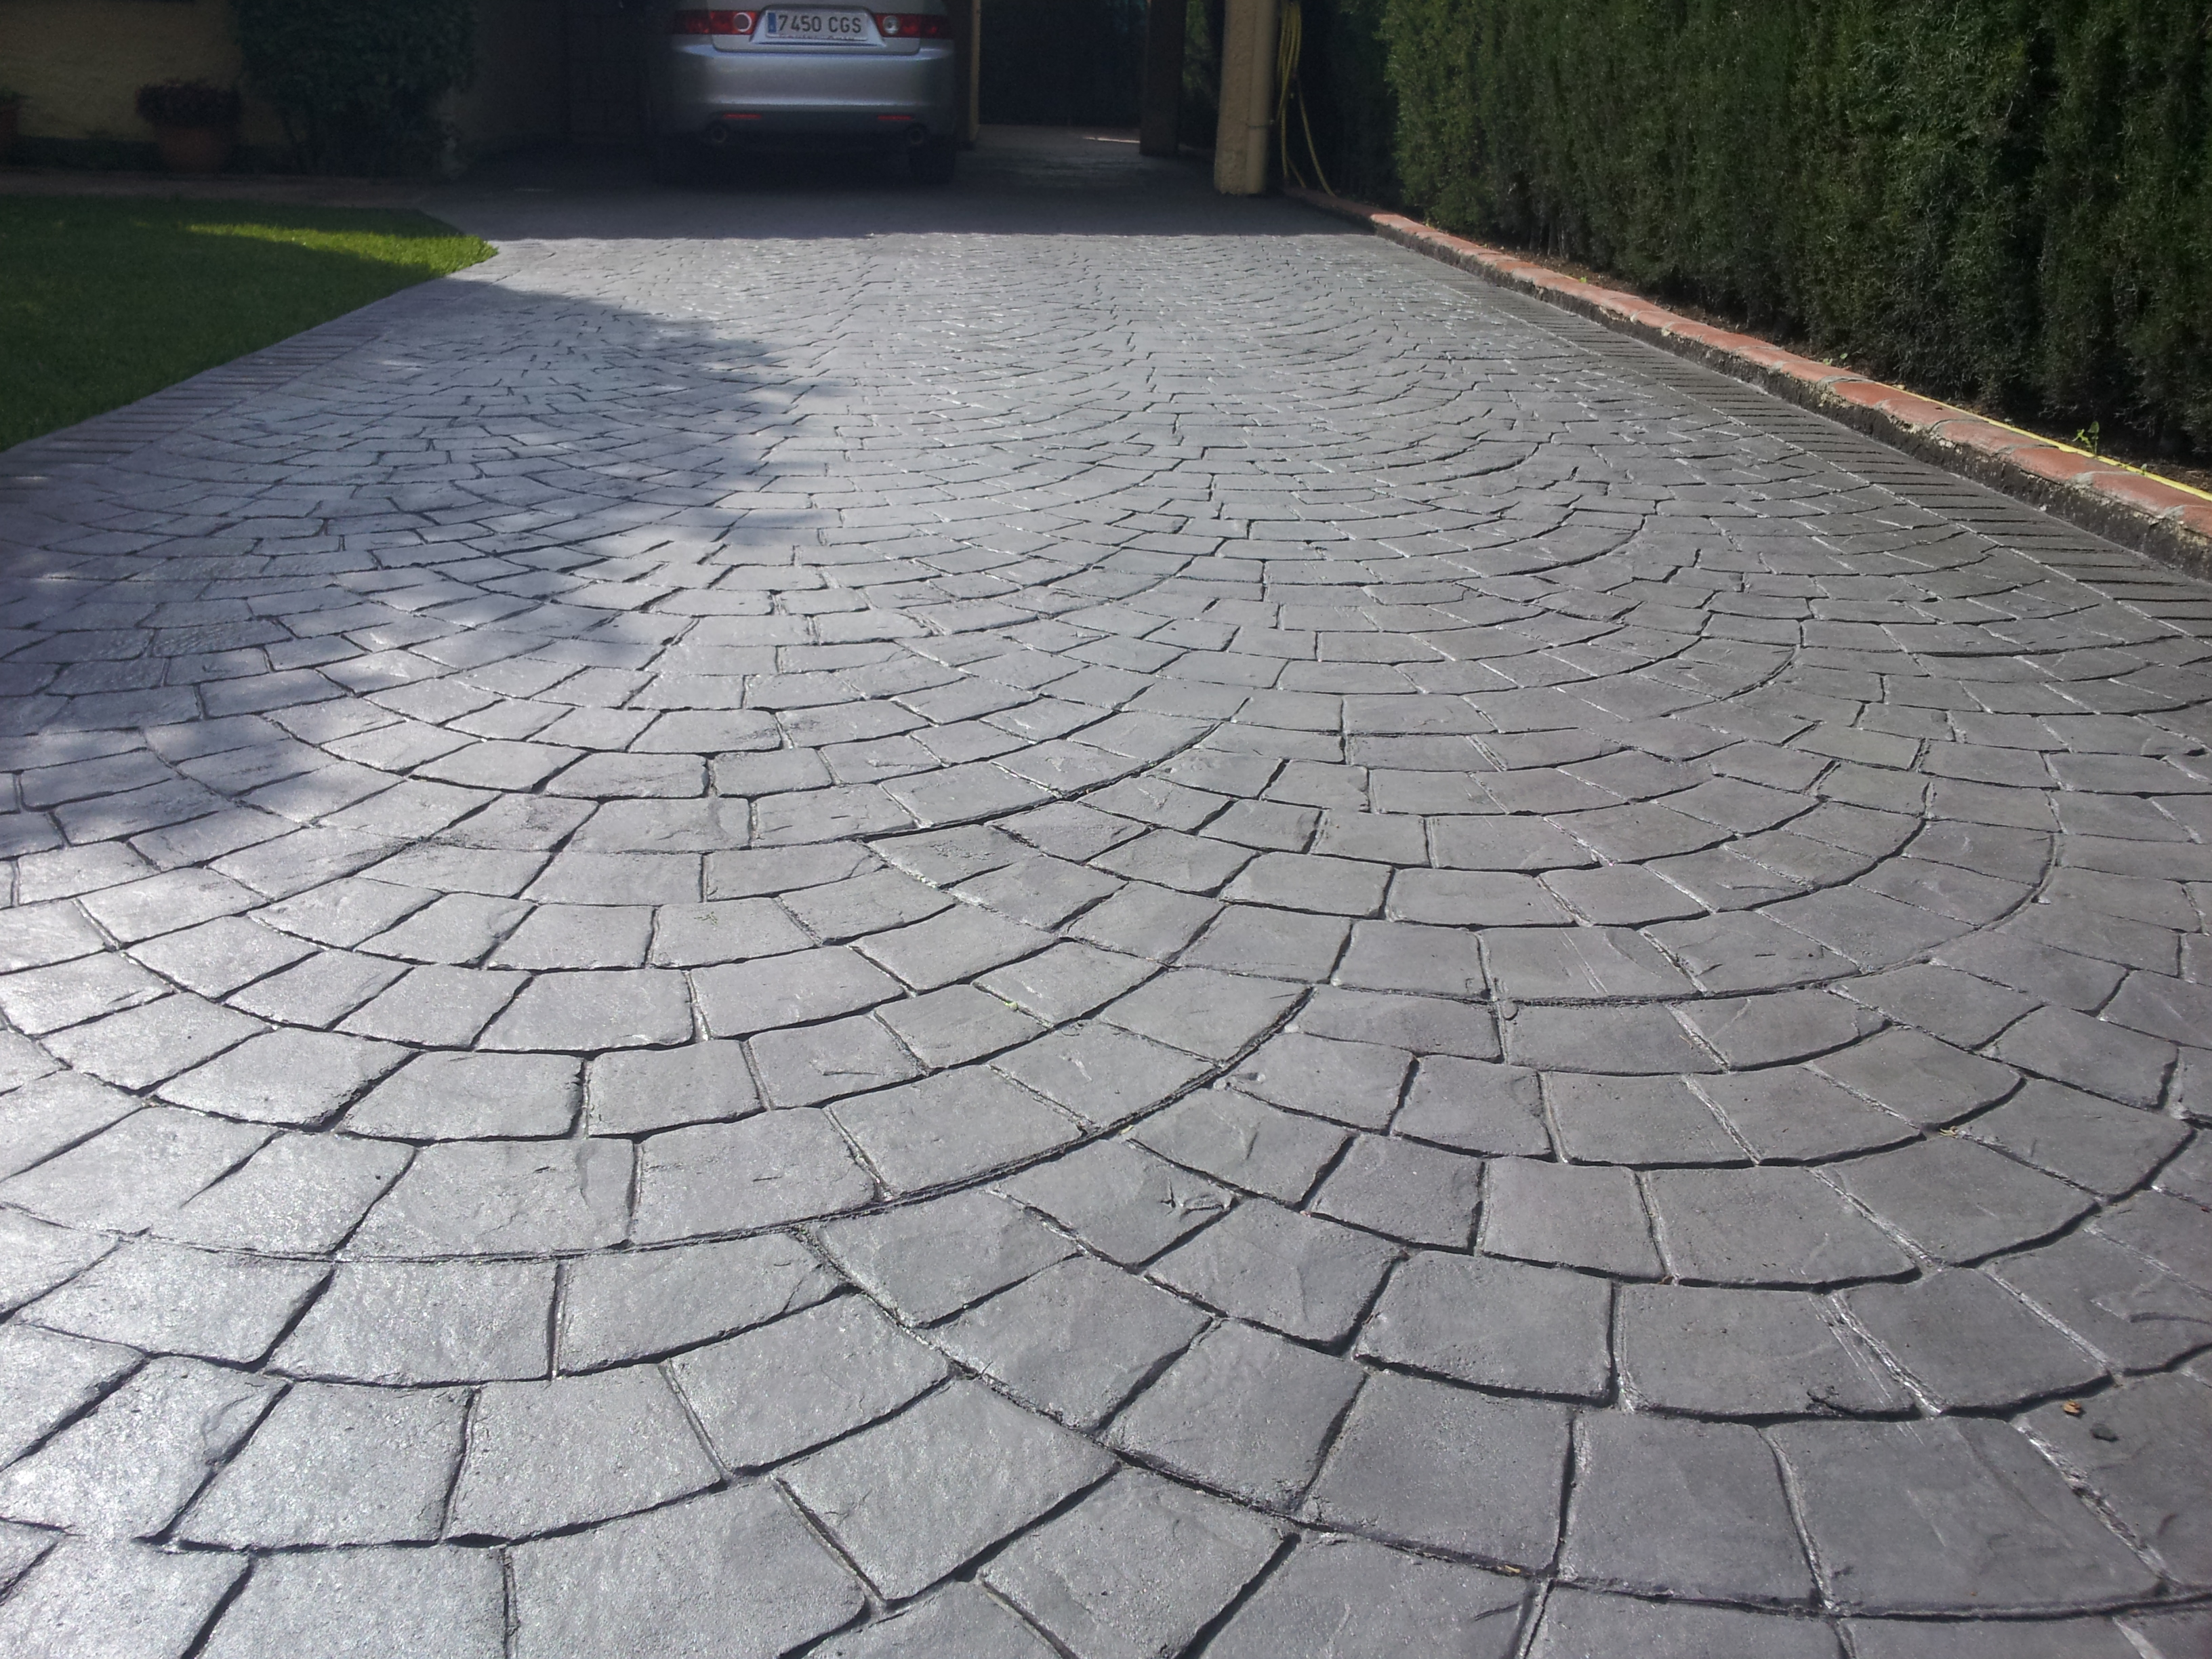 Hormigon impreso aspe hormigon impreso aspe cemento impreso aspe - Hormigon pulido exterior ...